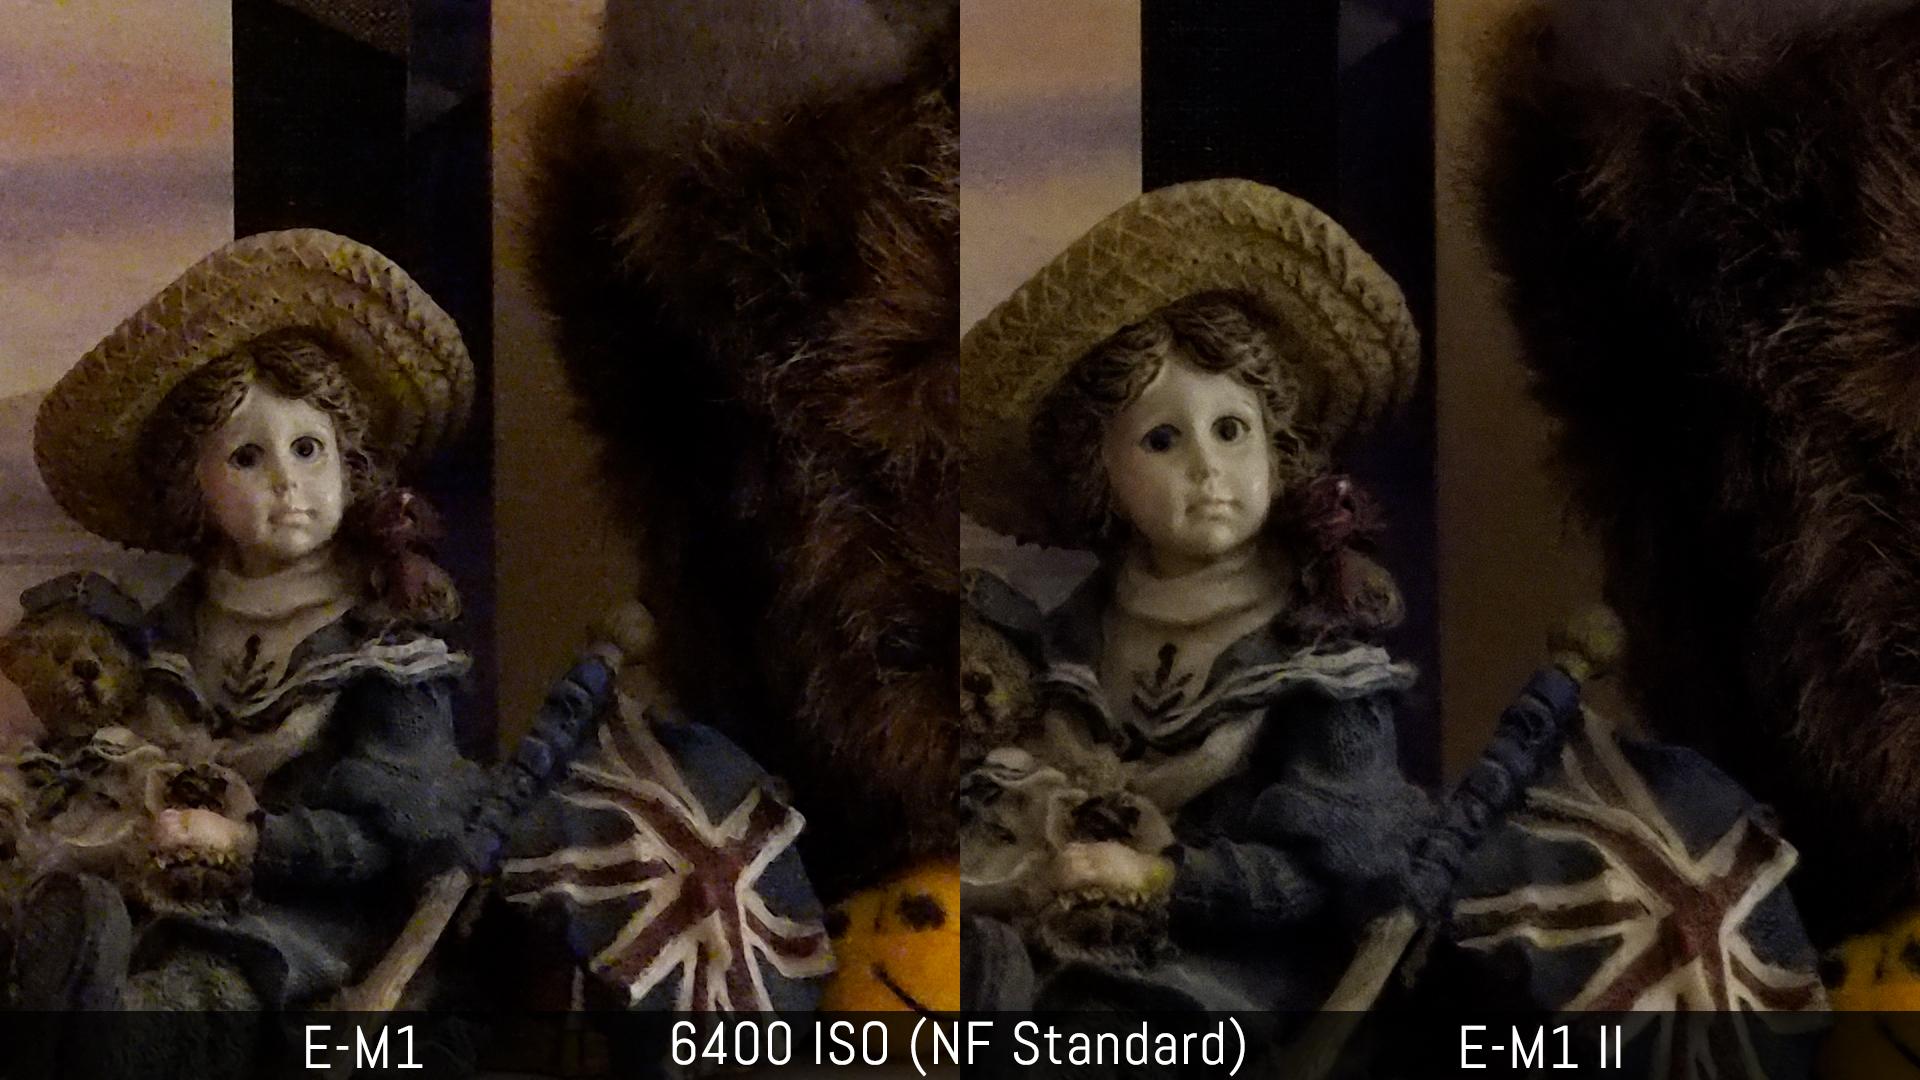 Olympus OM-D E-M1 vs OM-D E-M1 II – The complete comparison